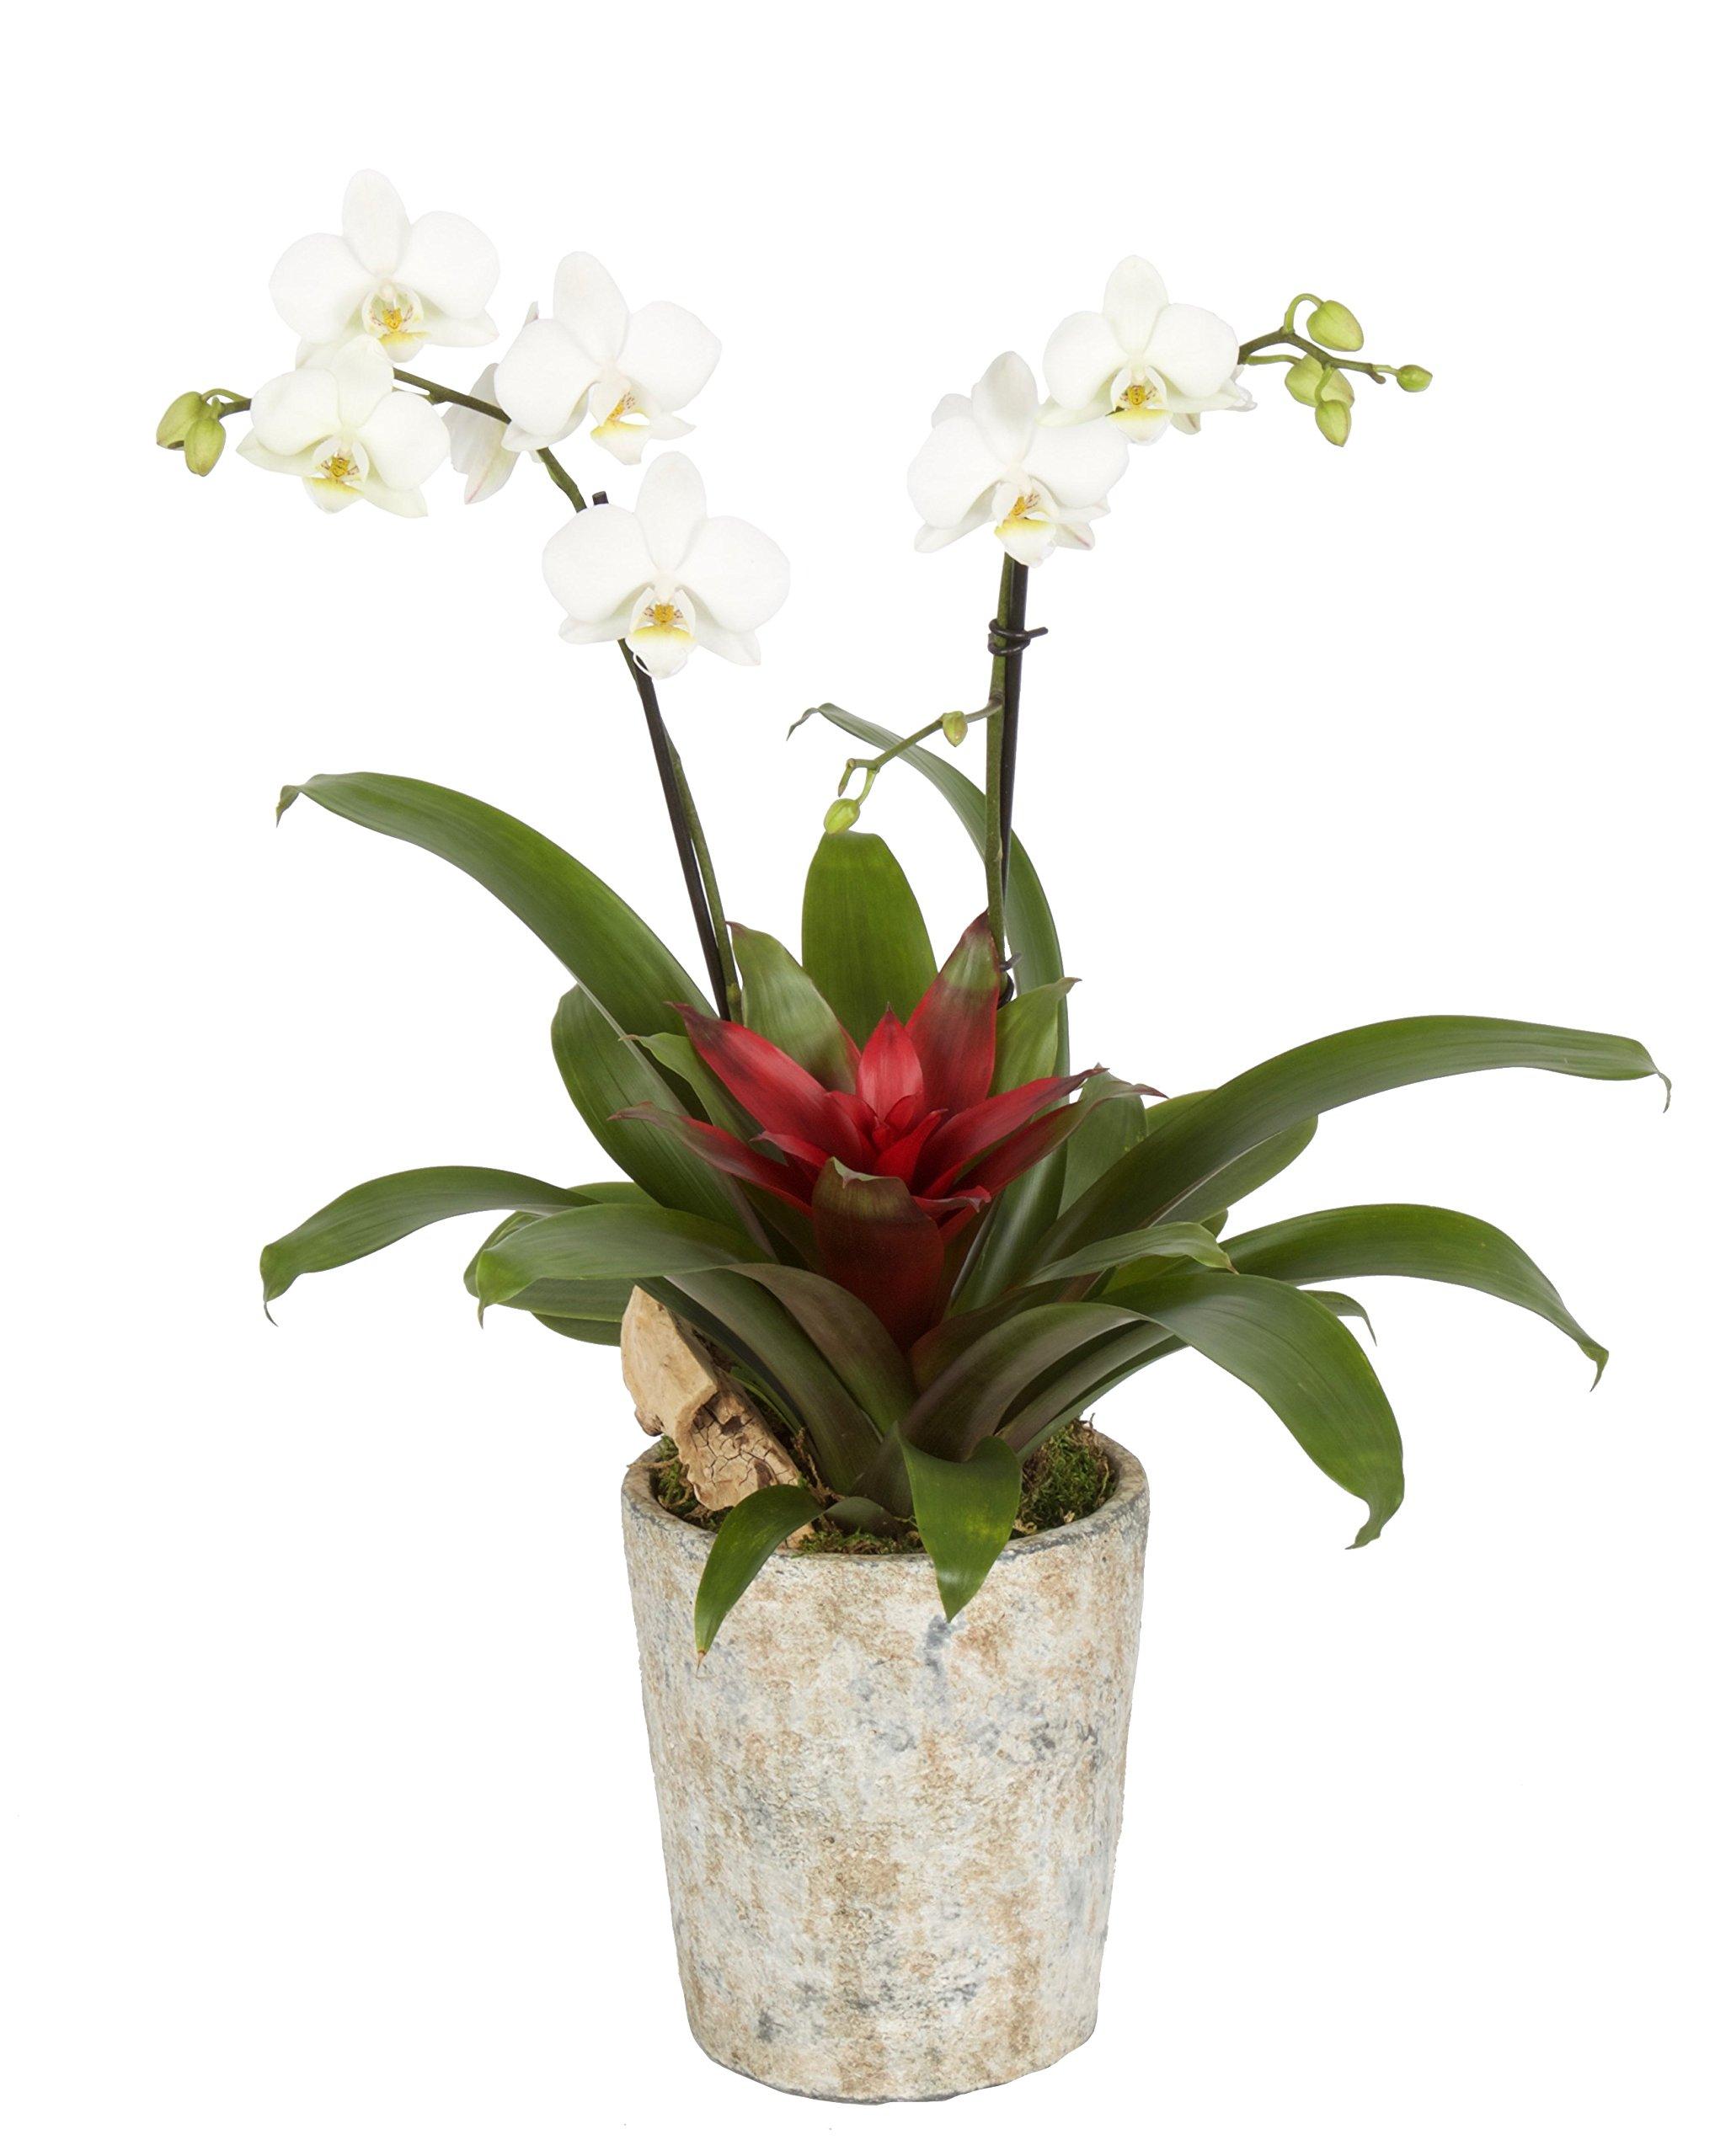 Color Orchids AMZ9101RI Live Double Stem Phalaenopsis, 15 x 20, White Blooms Orchid Garden Plant in Ceramic Pot,